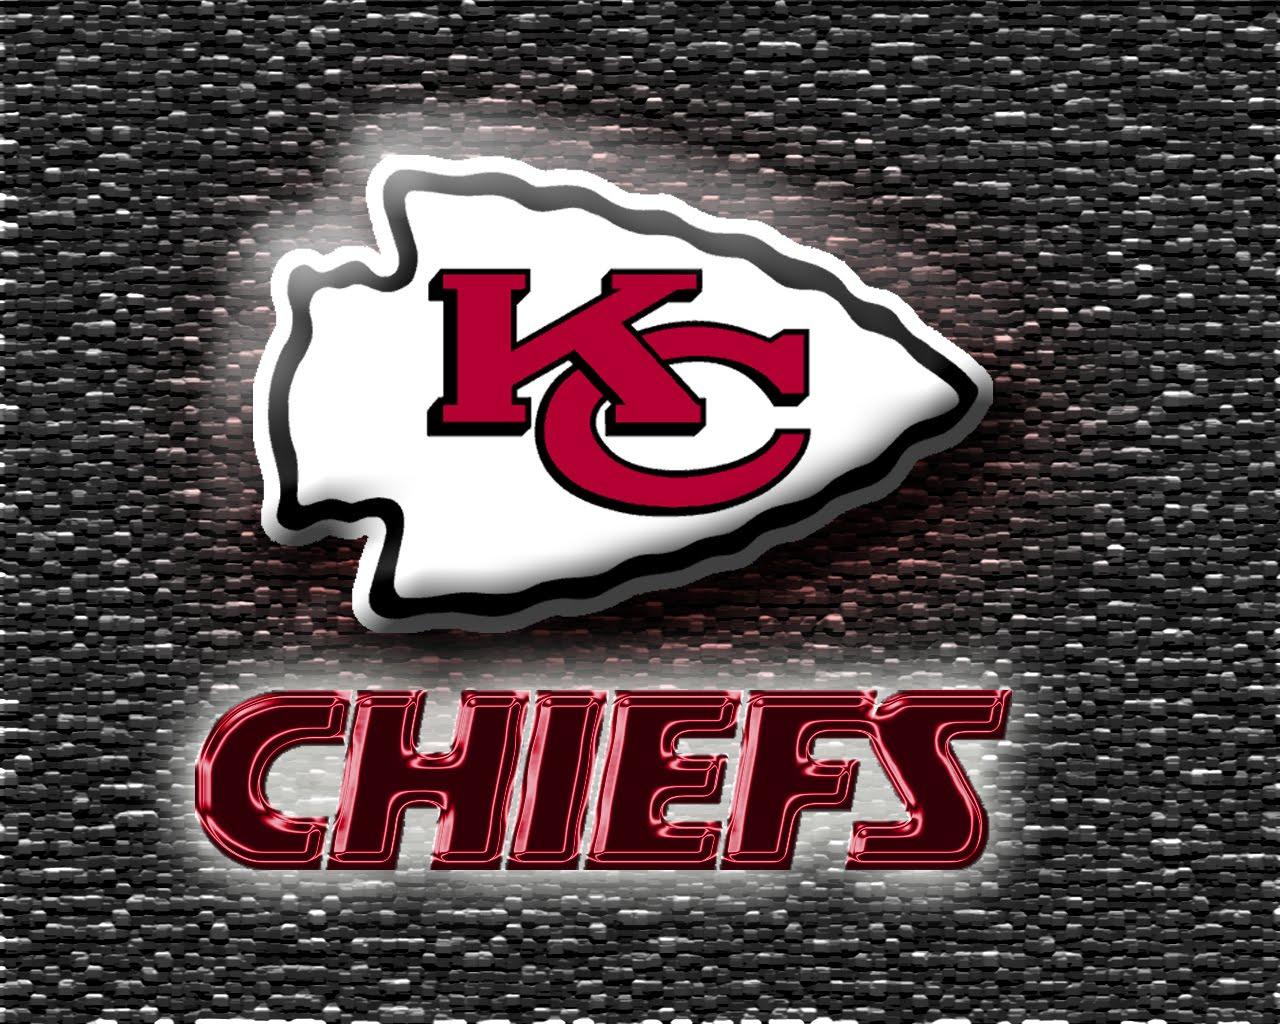 Kansas City Chiefs Wallpapers   Desktop Background Wallpapers 1280x1024